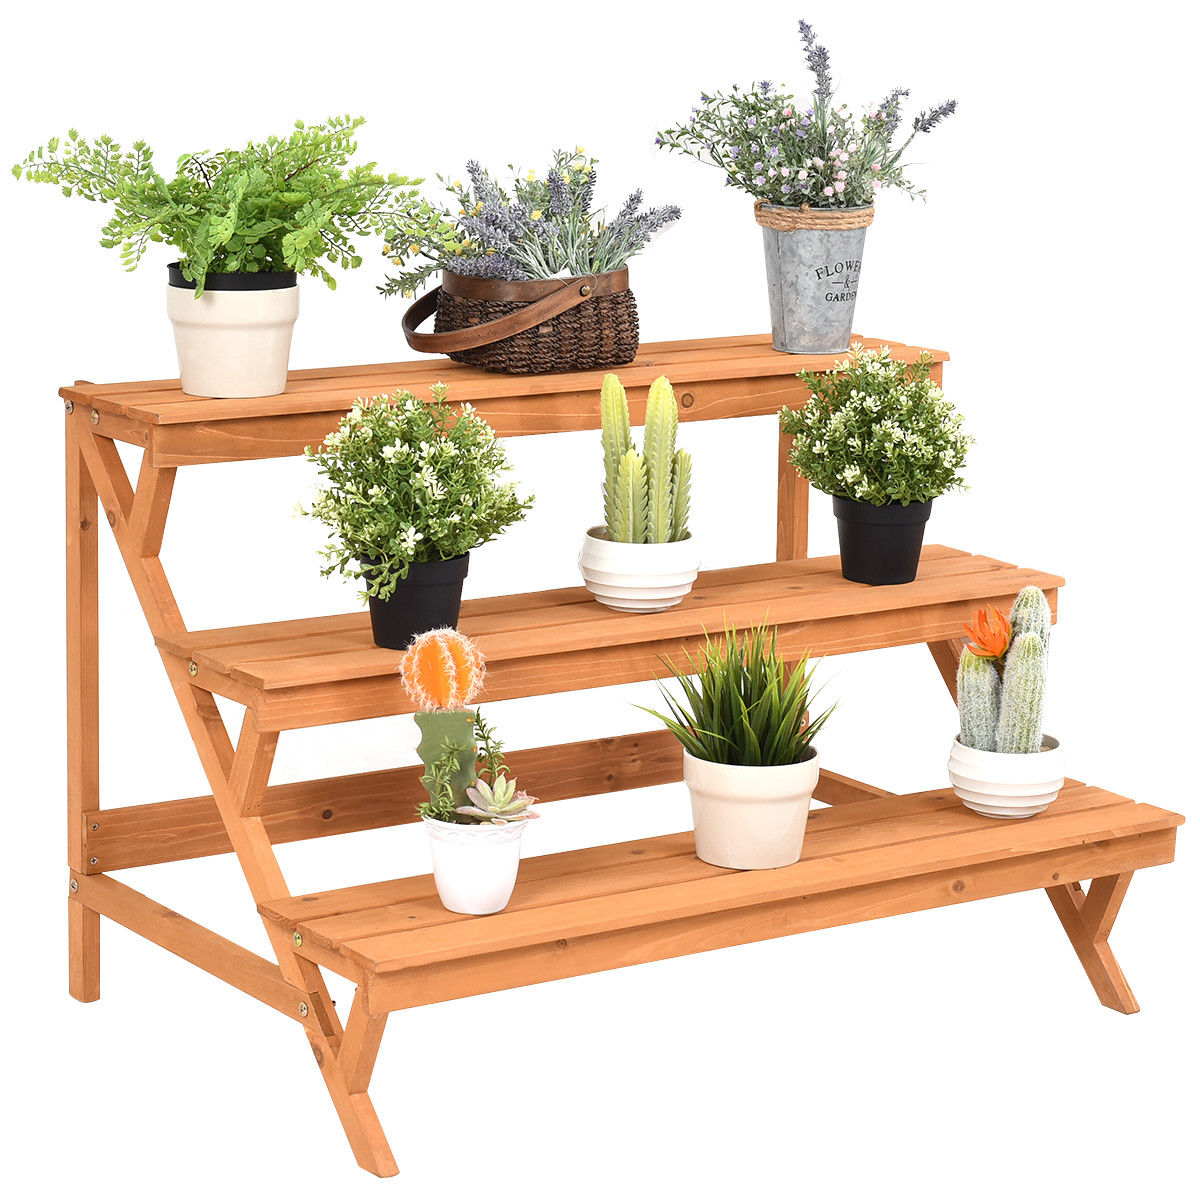 Costway 3 Tier Wood Plant Stand Flower Pot Holder Shelf Display Rack Stand Step Ladder Walmart Com Walmart Com